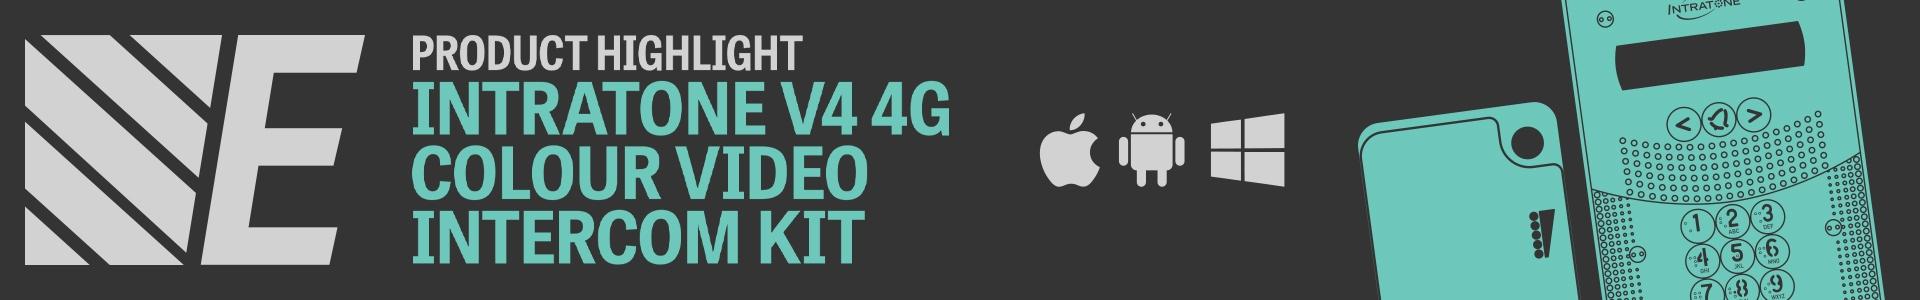 Product Highlight - Intratone V4 4G Colour Video Intercom Kits